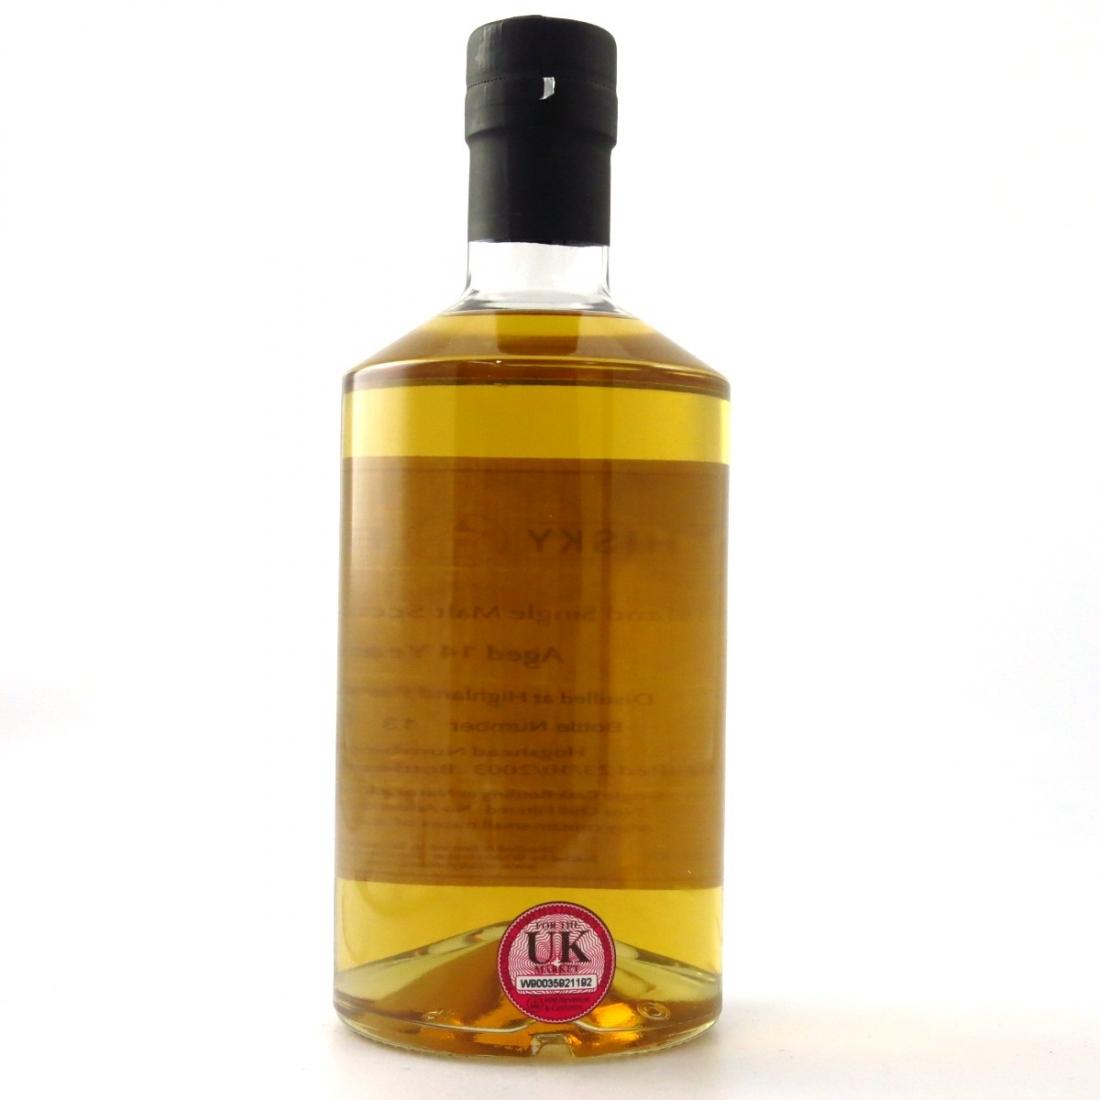 Highland Park 2003 Whisky Broker 14 Year Old